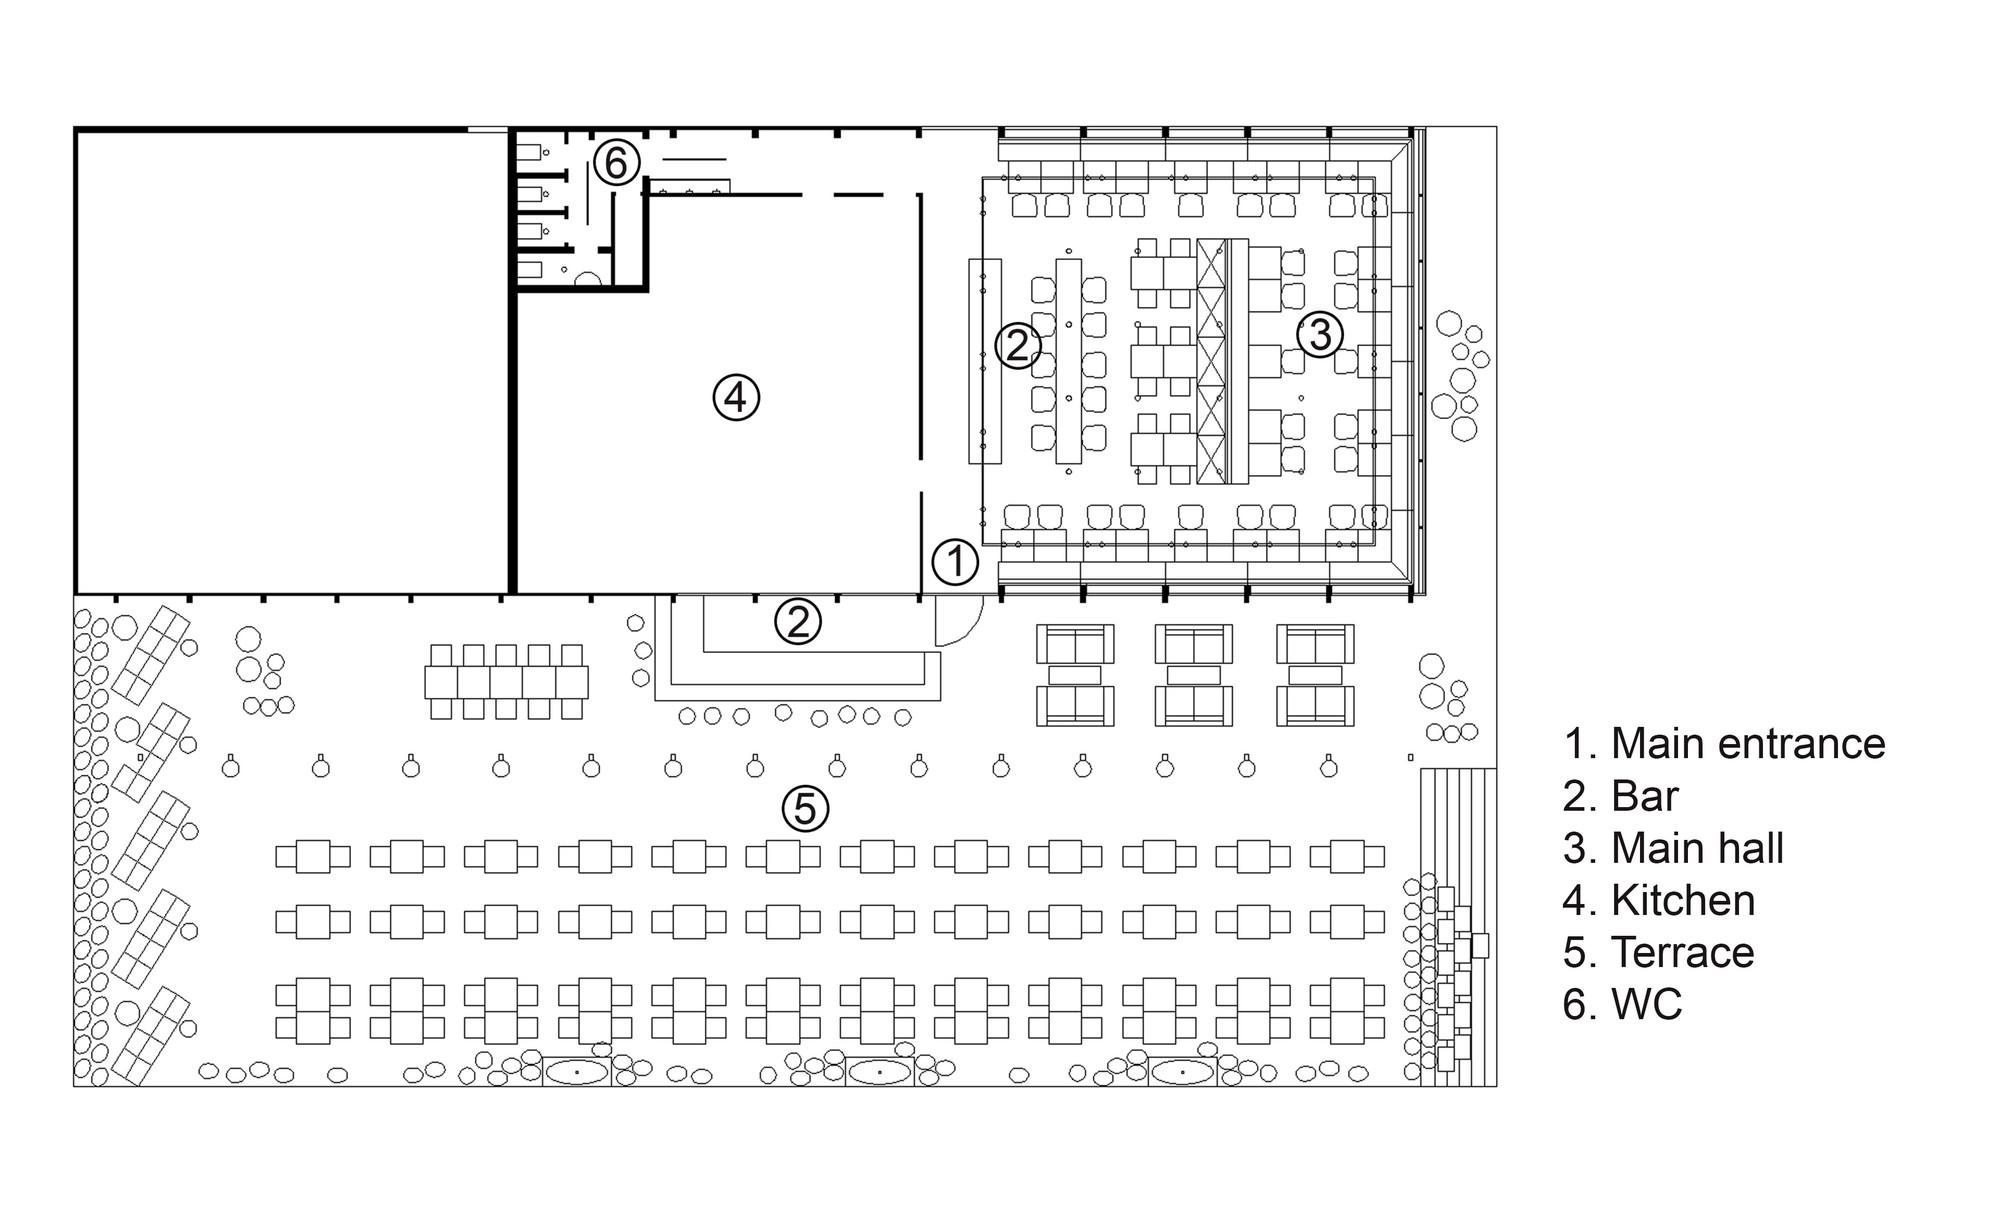 Bakery Design Floor Plan Gallery Of Bulka Cafe And Bakery Crosby Studios 15